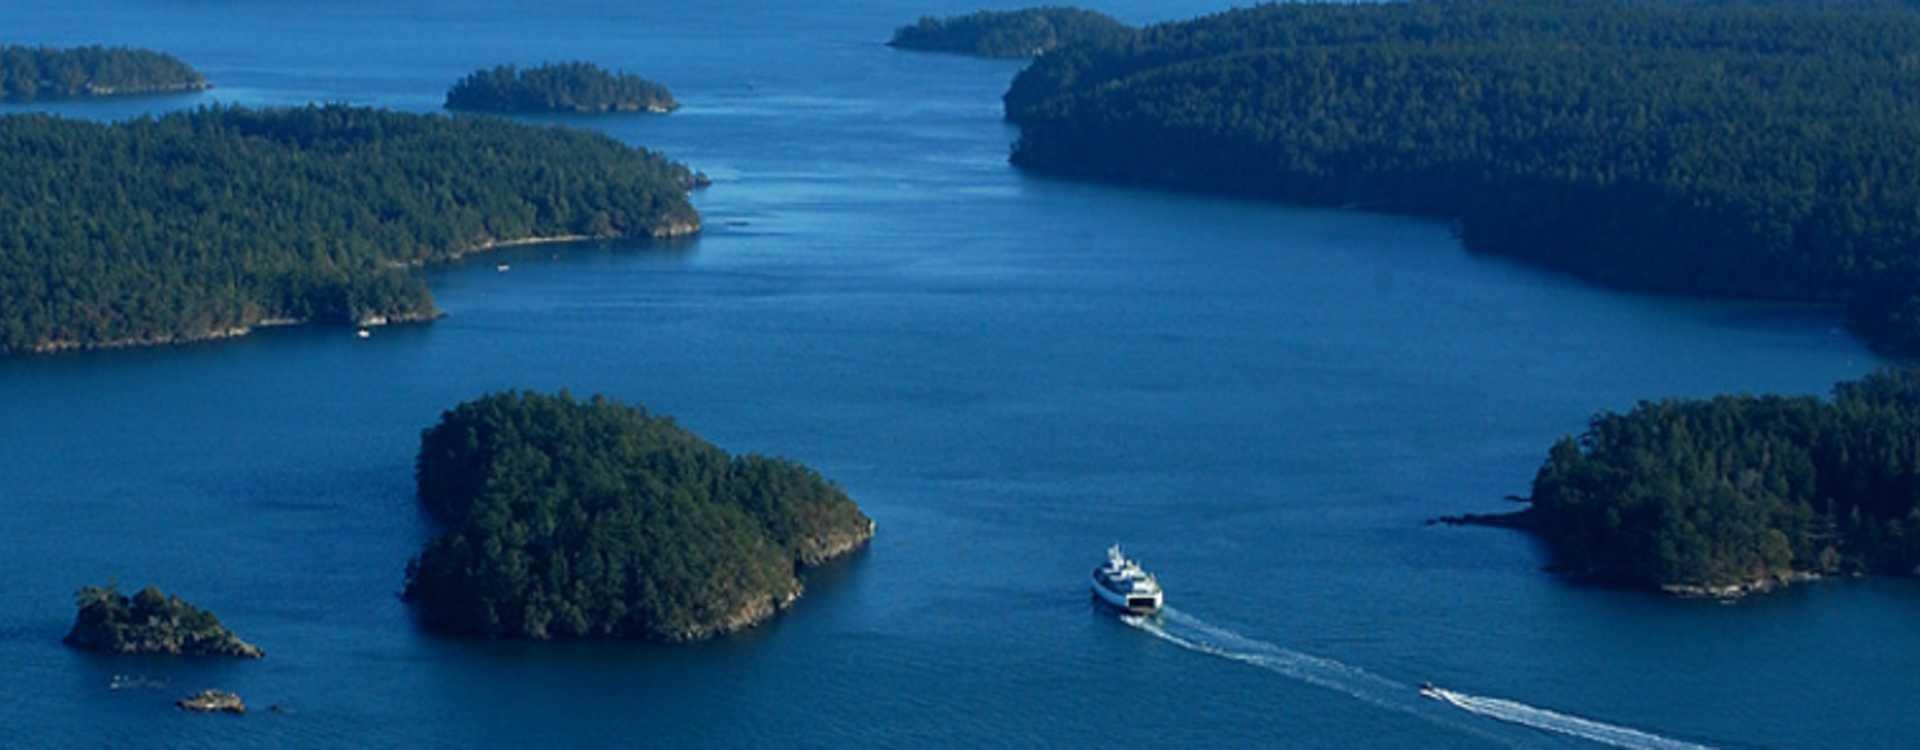 San_Juan_Islands.jpg